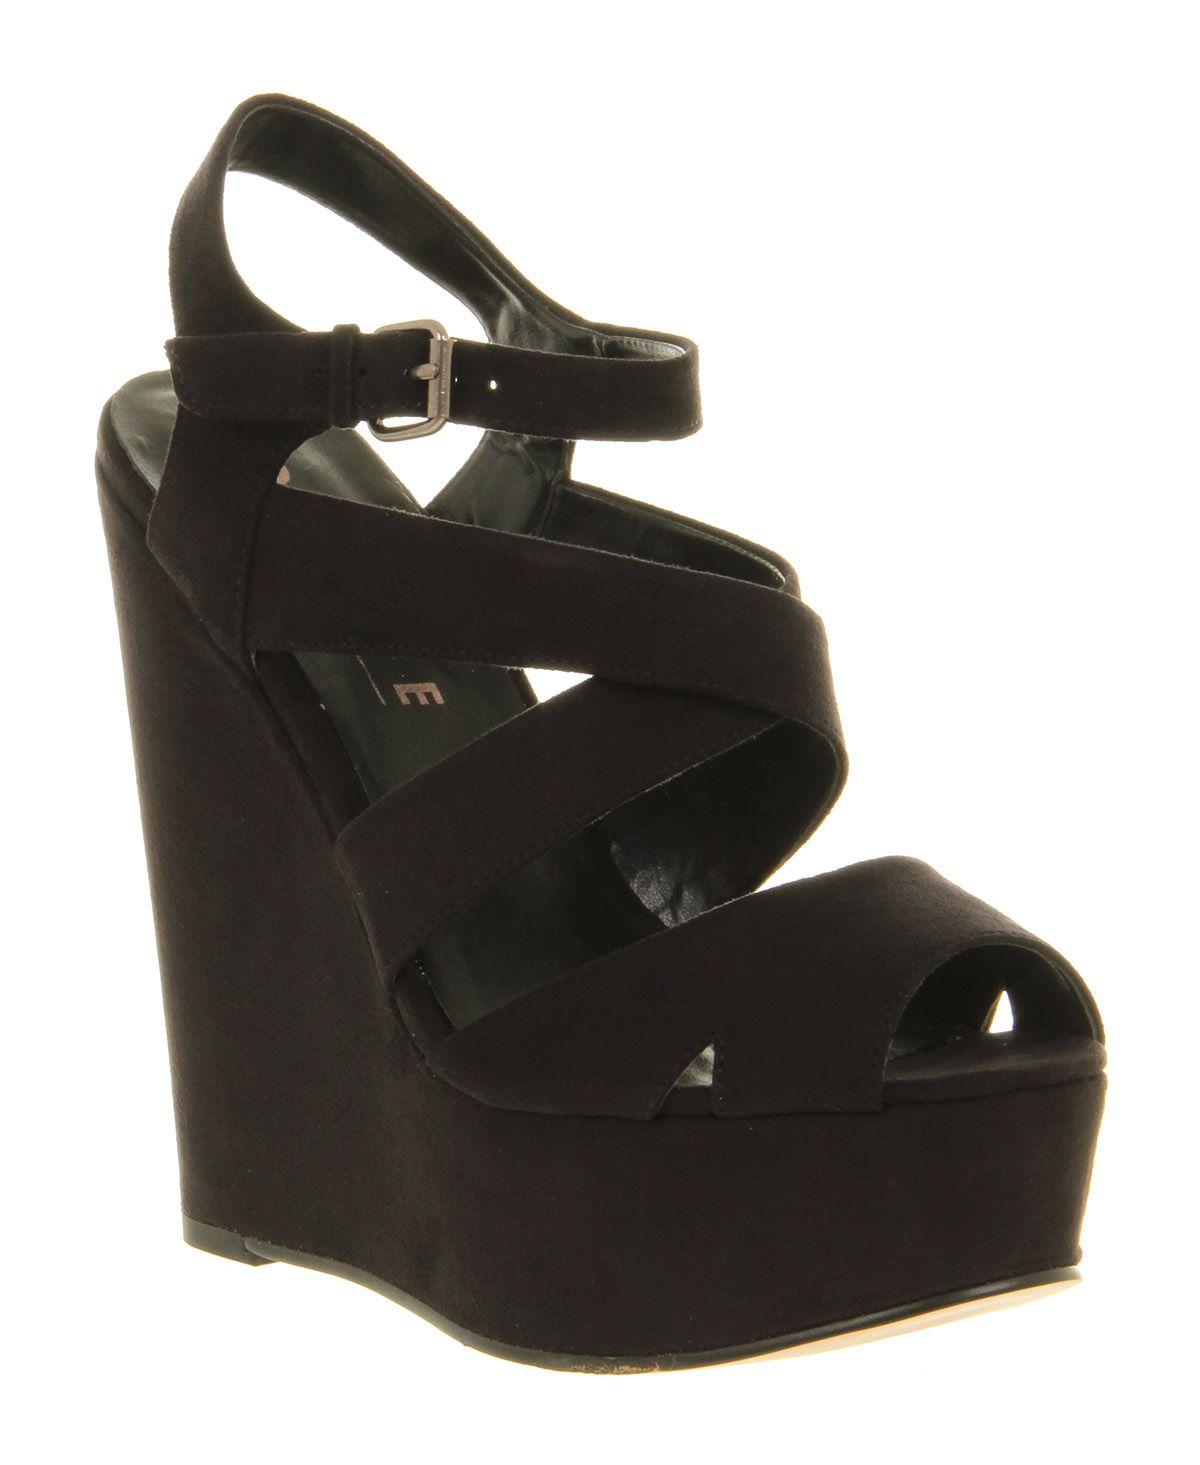 Office Wah Wah Wedge Black Microfibre - High Heels | shoes I want ...